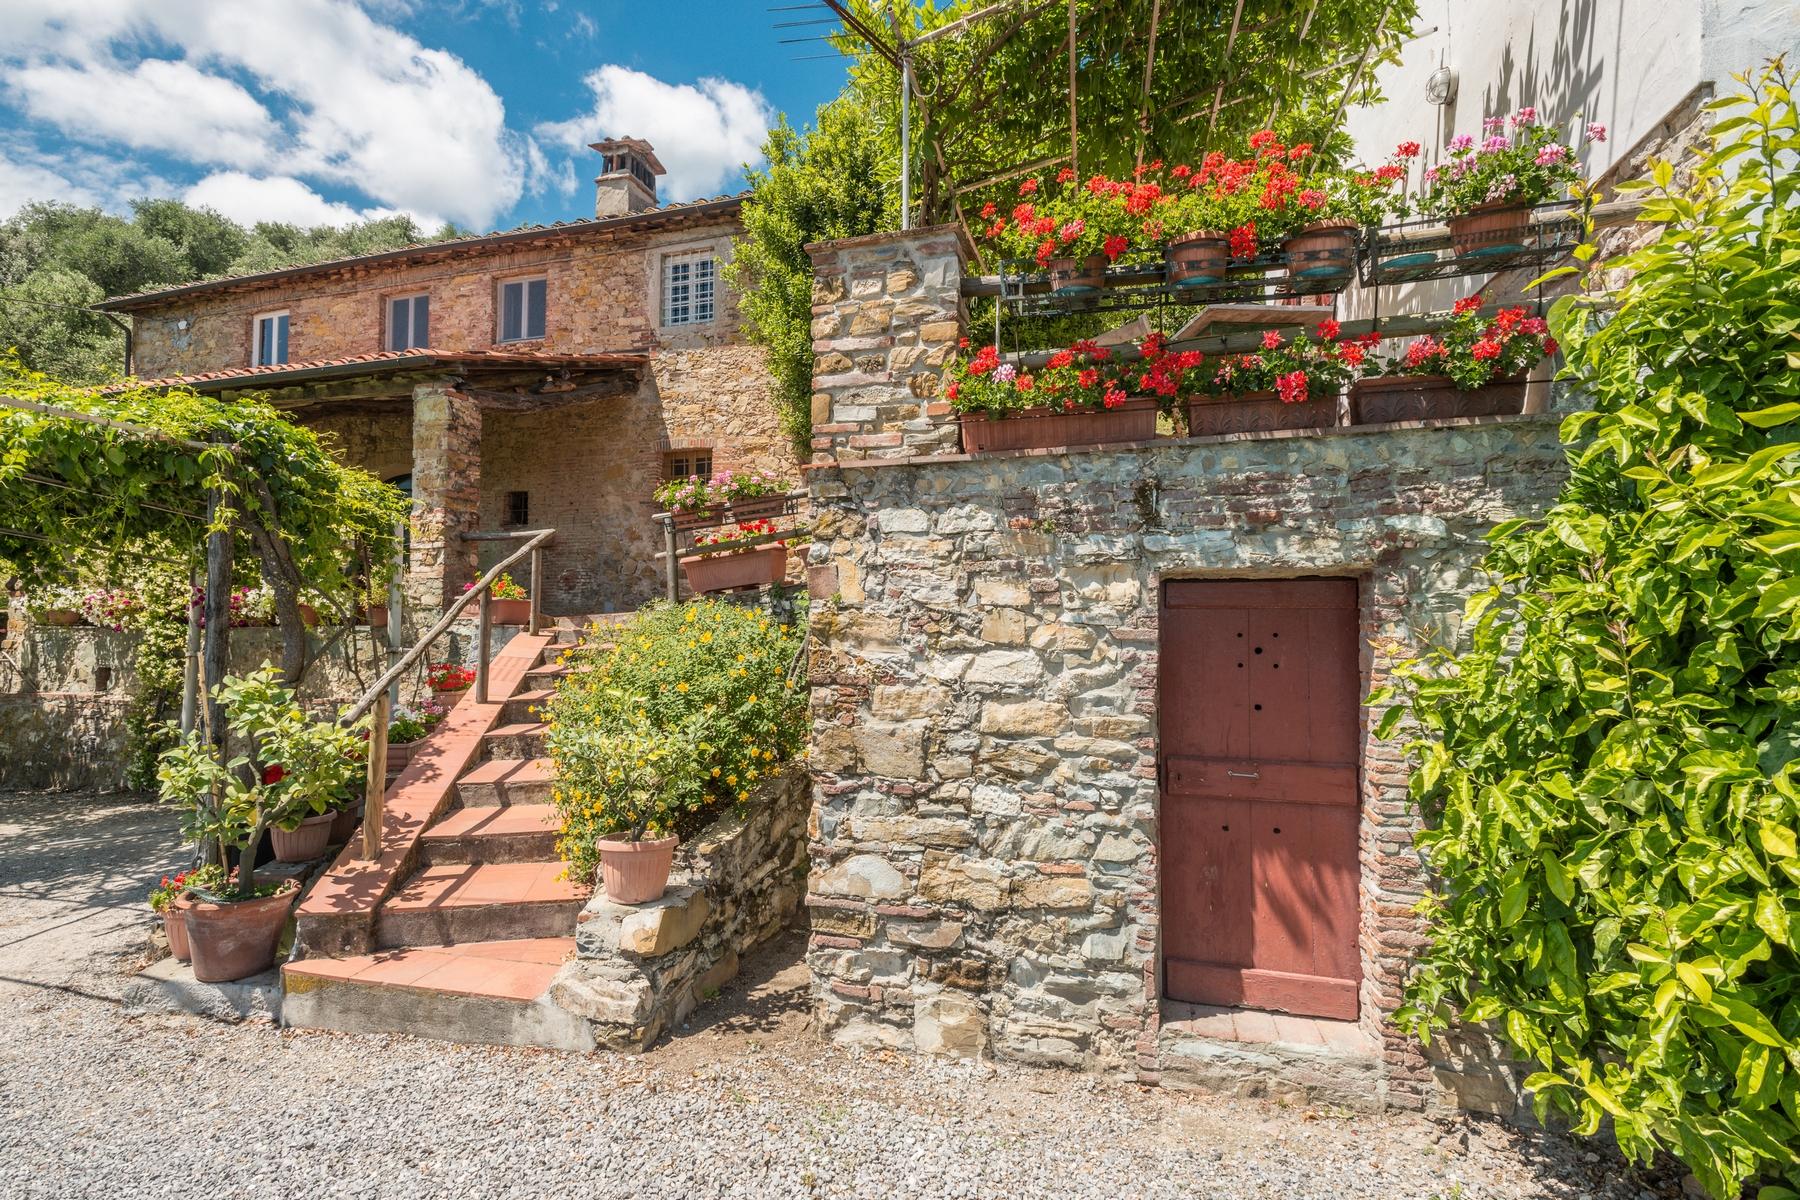 Villa in Vendita a Lucca: 5 locali, 550 mq - Foto 3